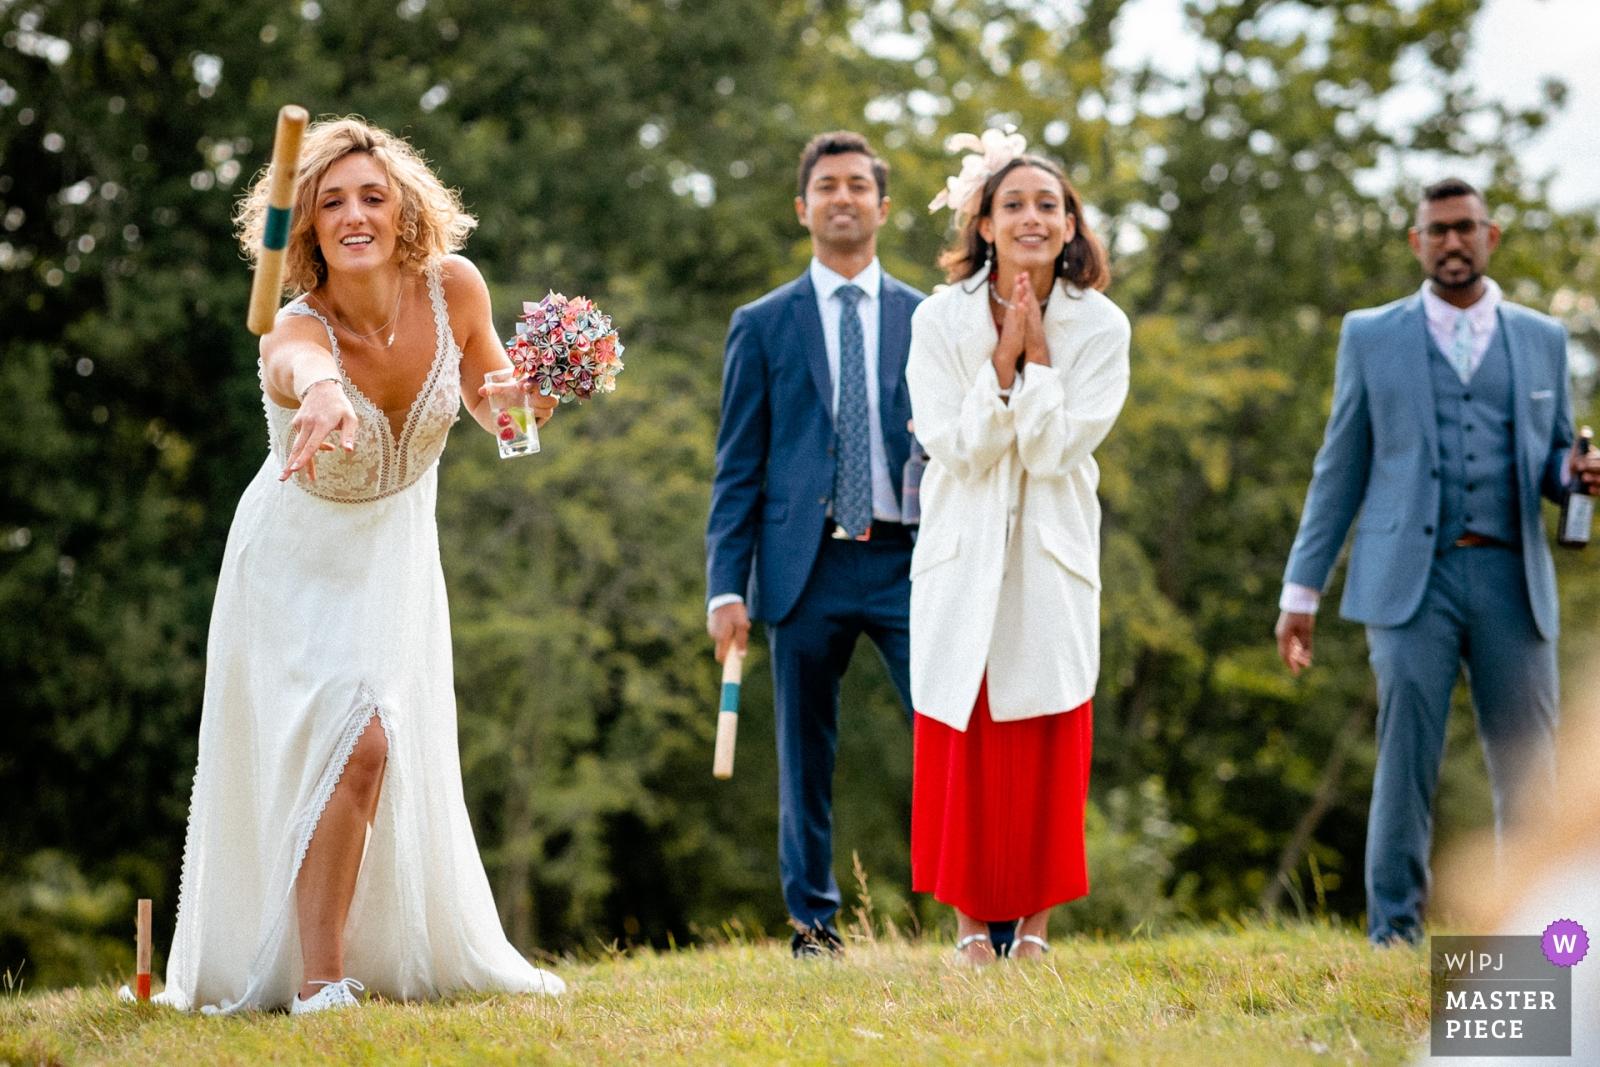 Bride playing garden games - Hertfordshire, England Wedding Photography -    Swallows Oast, UK